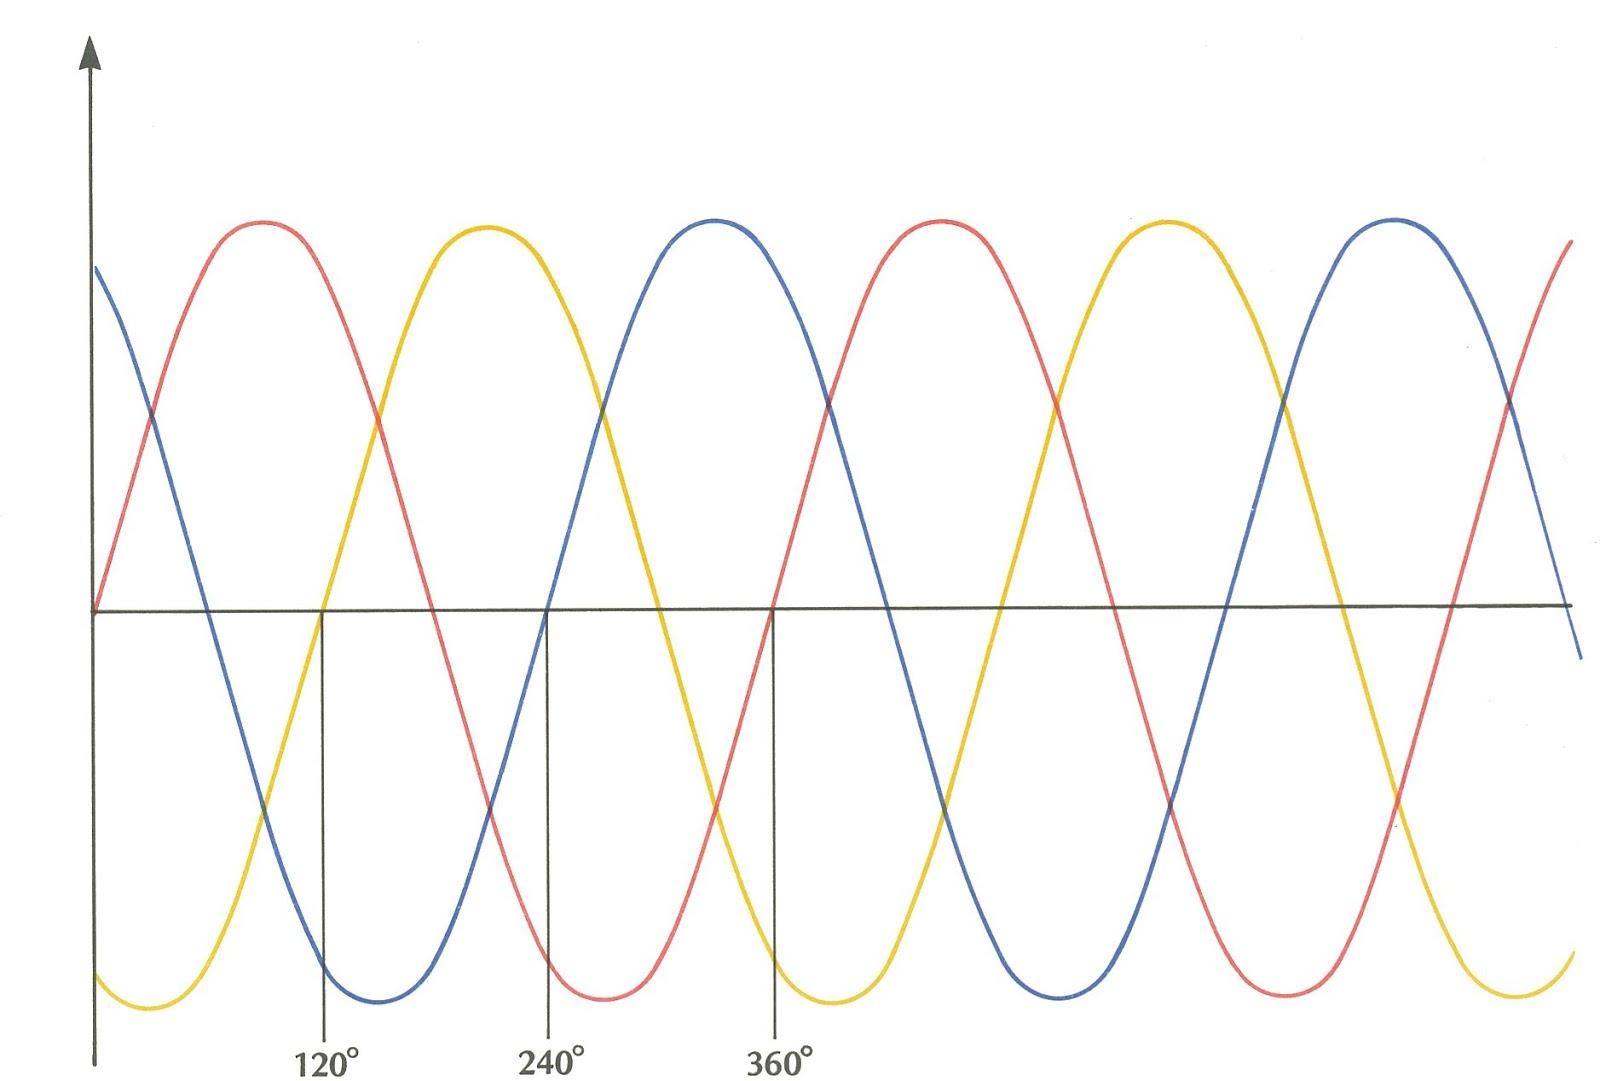 allis chalmers ca wiring diagram images allis chalmers b c ca allis chalmers wiring schematic nilza b c [ 1600 x 1081 Pixel ]